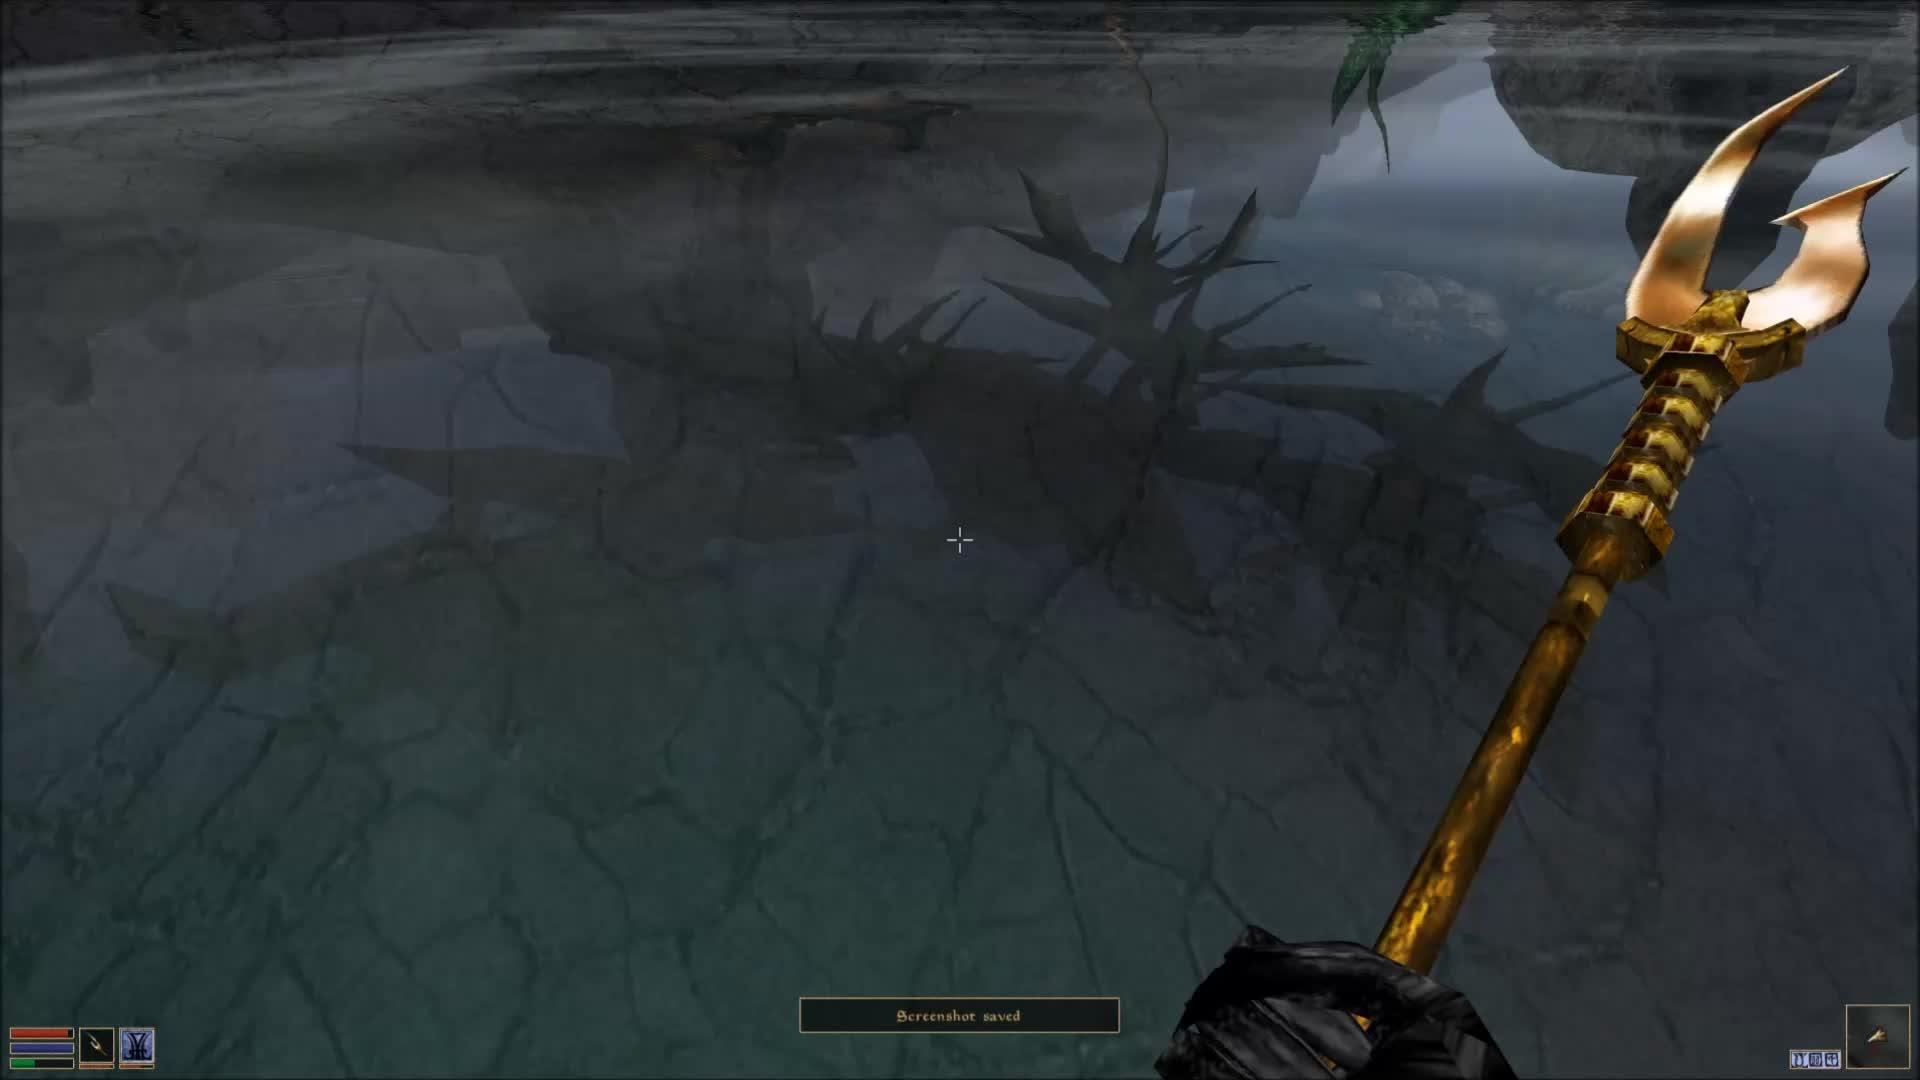 Elder Scrolls III Morrowind, *Angry Cliff Racer Noises* GIFs